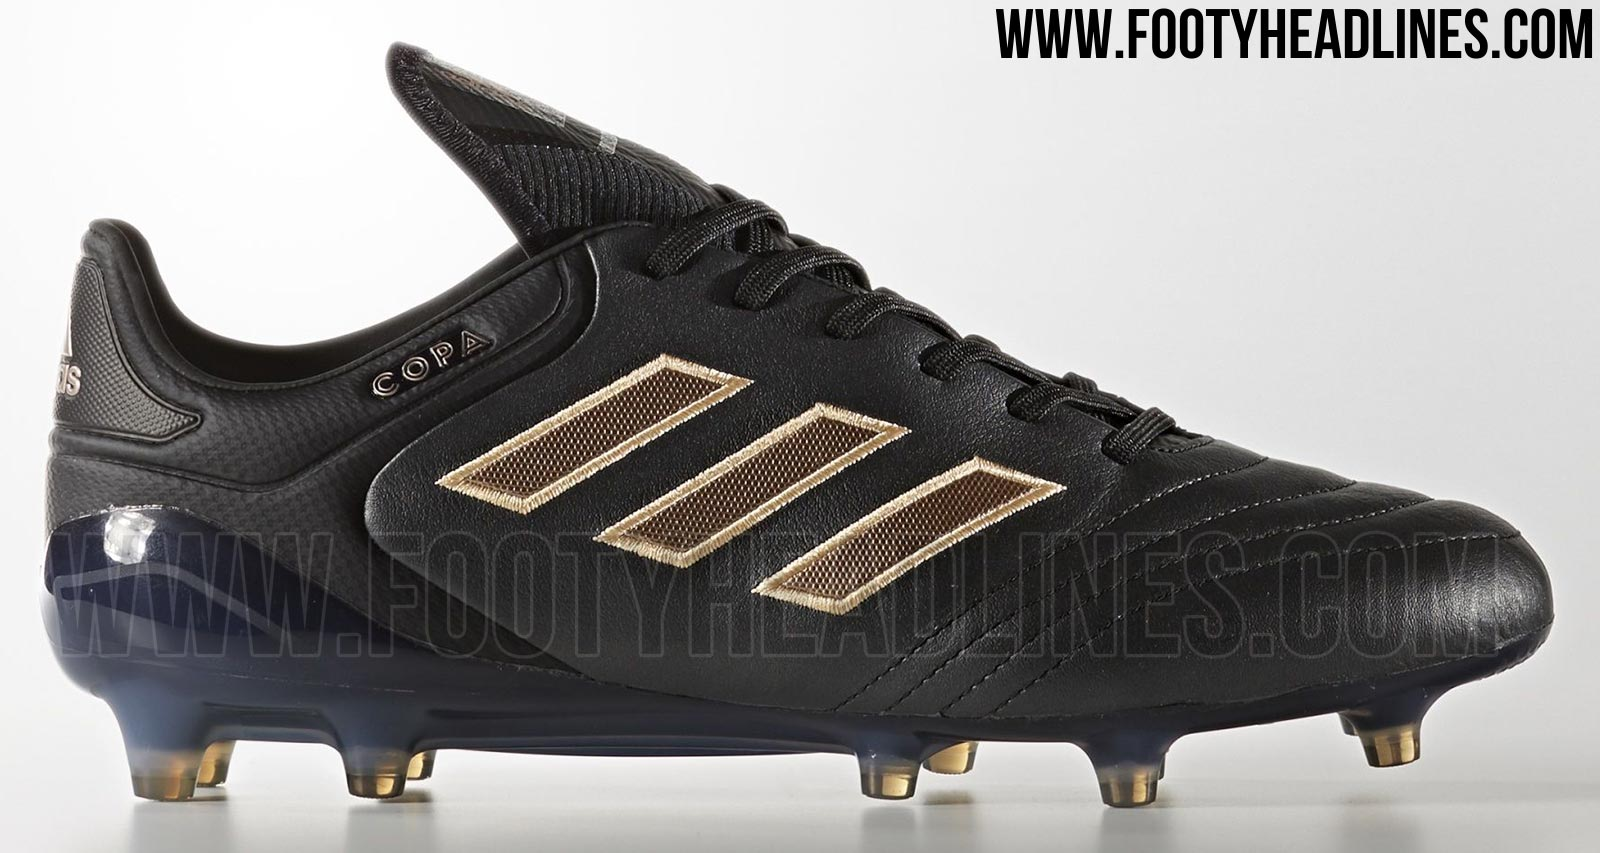 adidas copa mundial black and gold